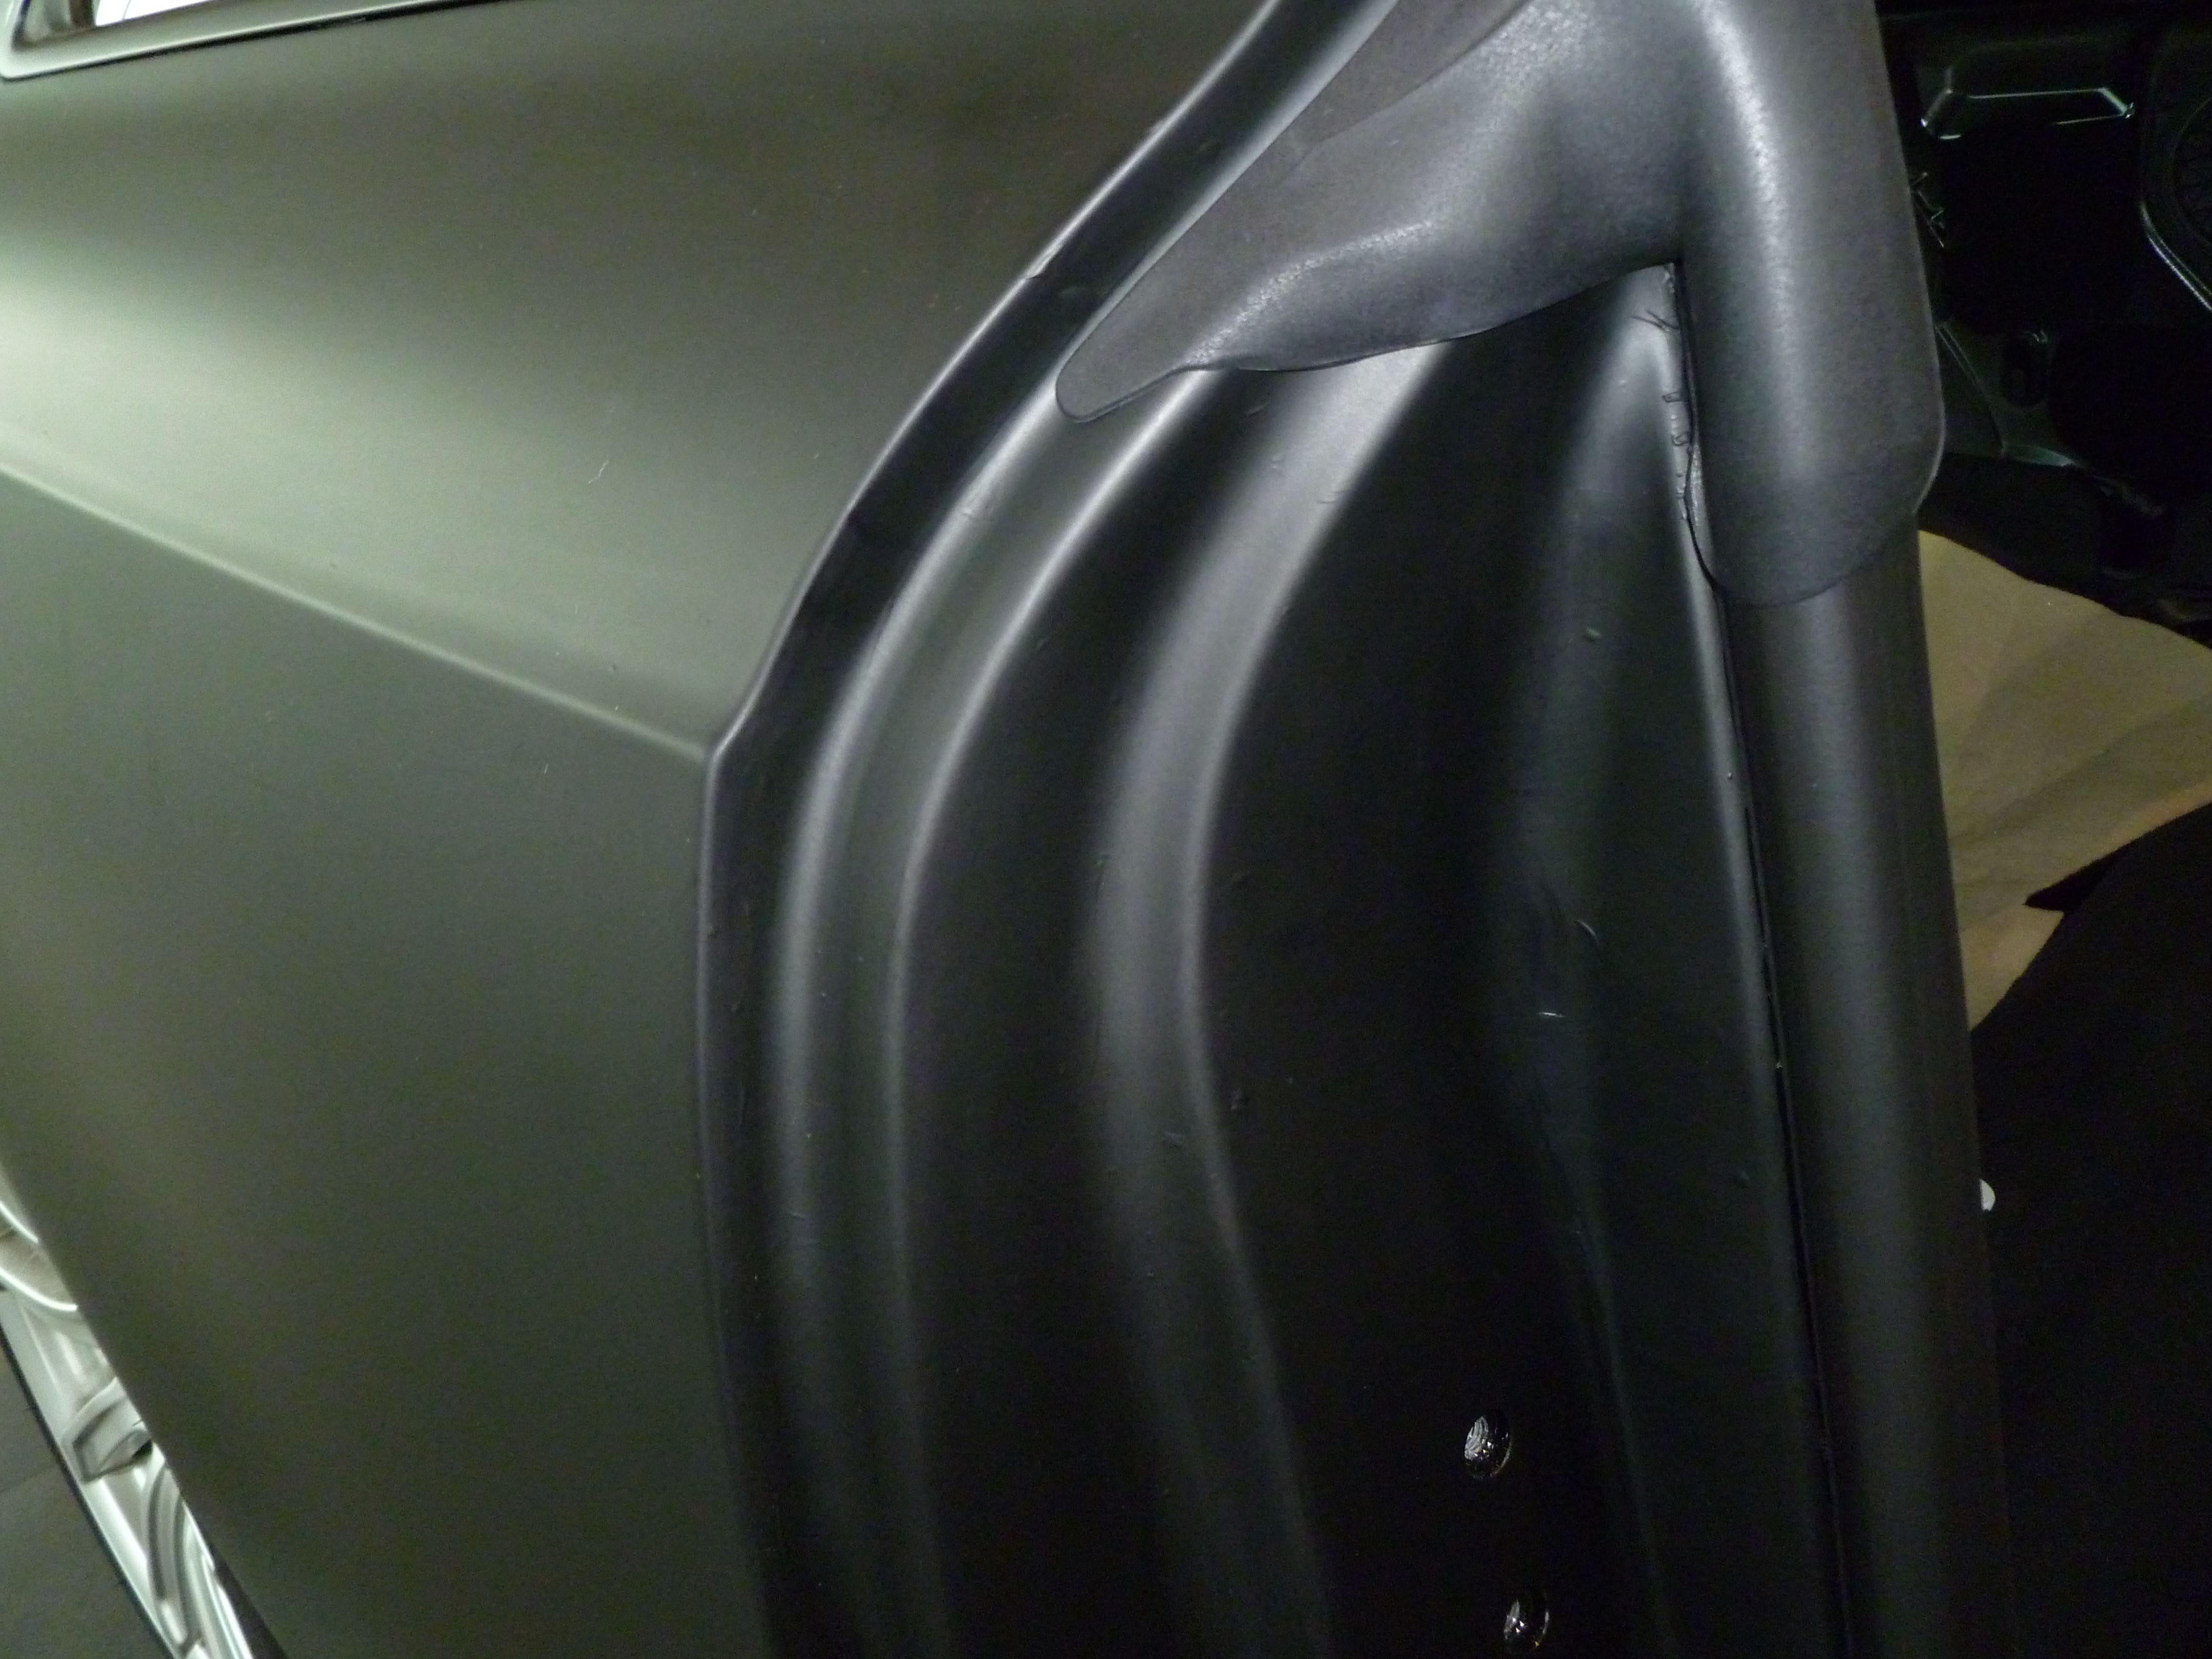 Audi A5 Coupe met Mat Zwarte Wrap, Carwrapping door Wrapmyride.nu Foto-nr:4630, ©2021